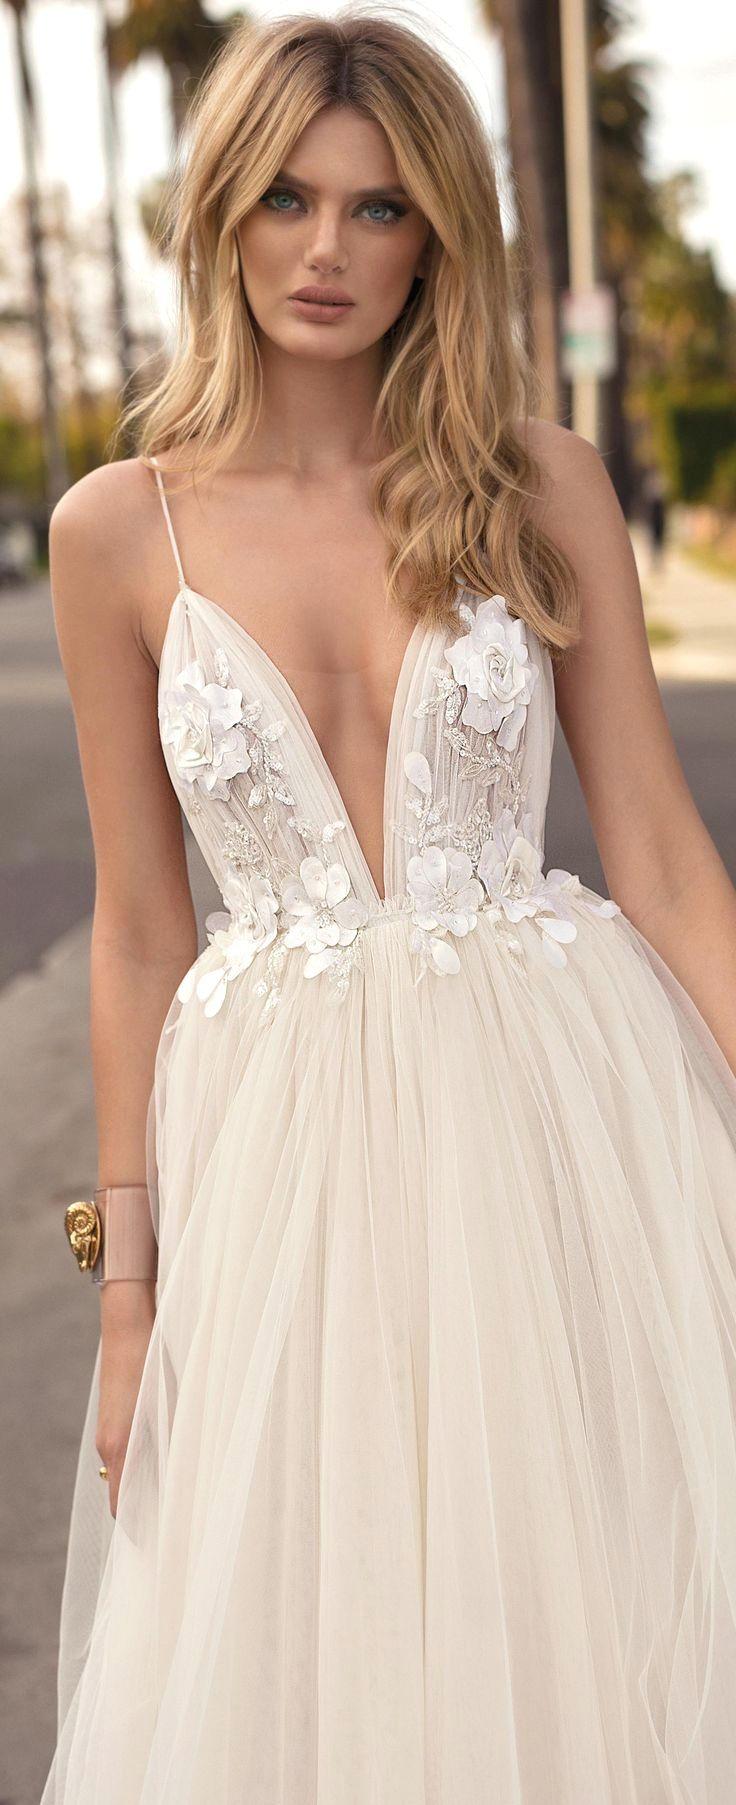 Romantic Bridal Dresses #bridaldresses  Kleid hochzeit, Kleider